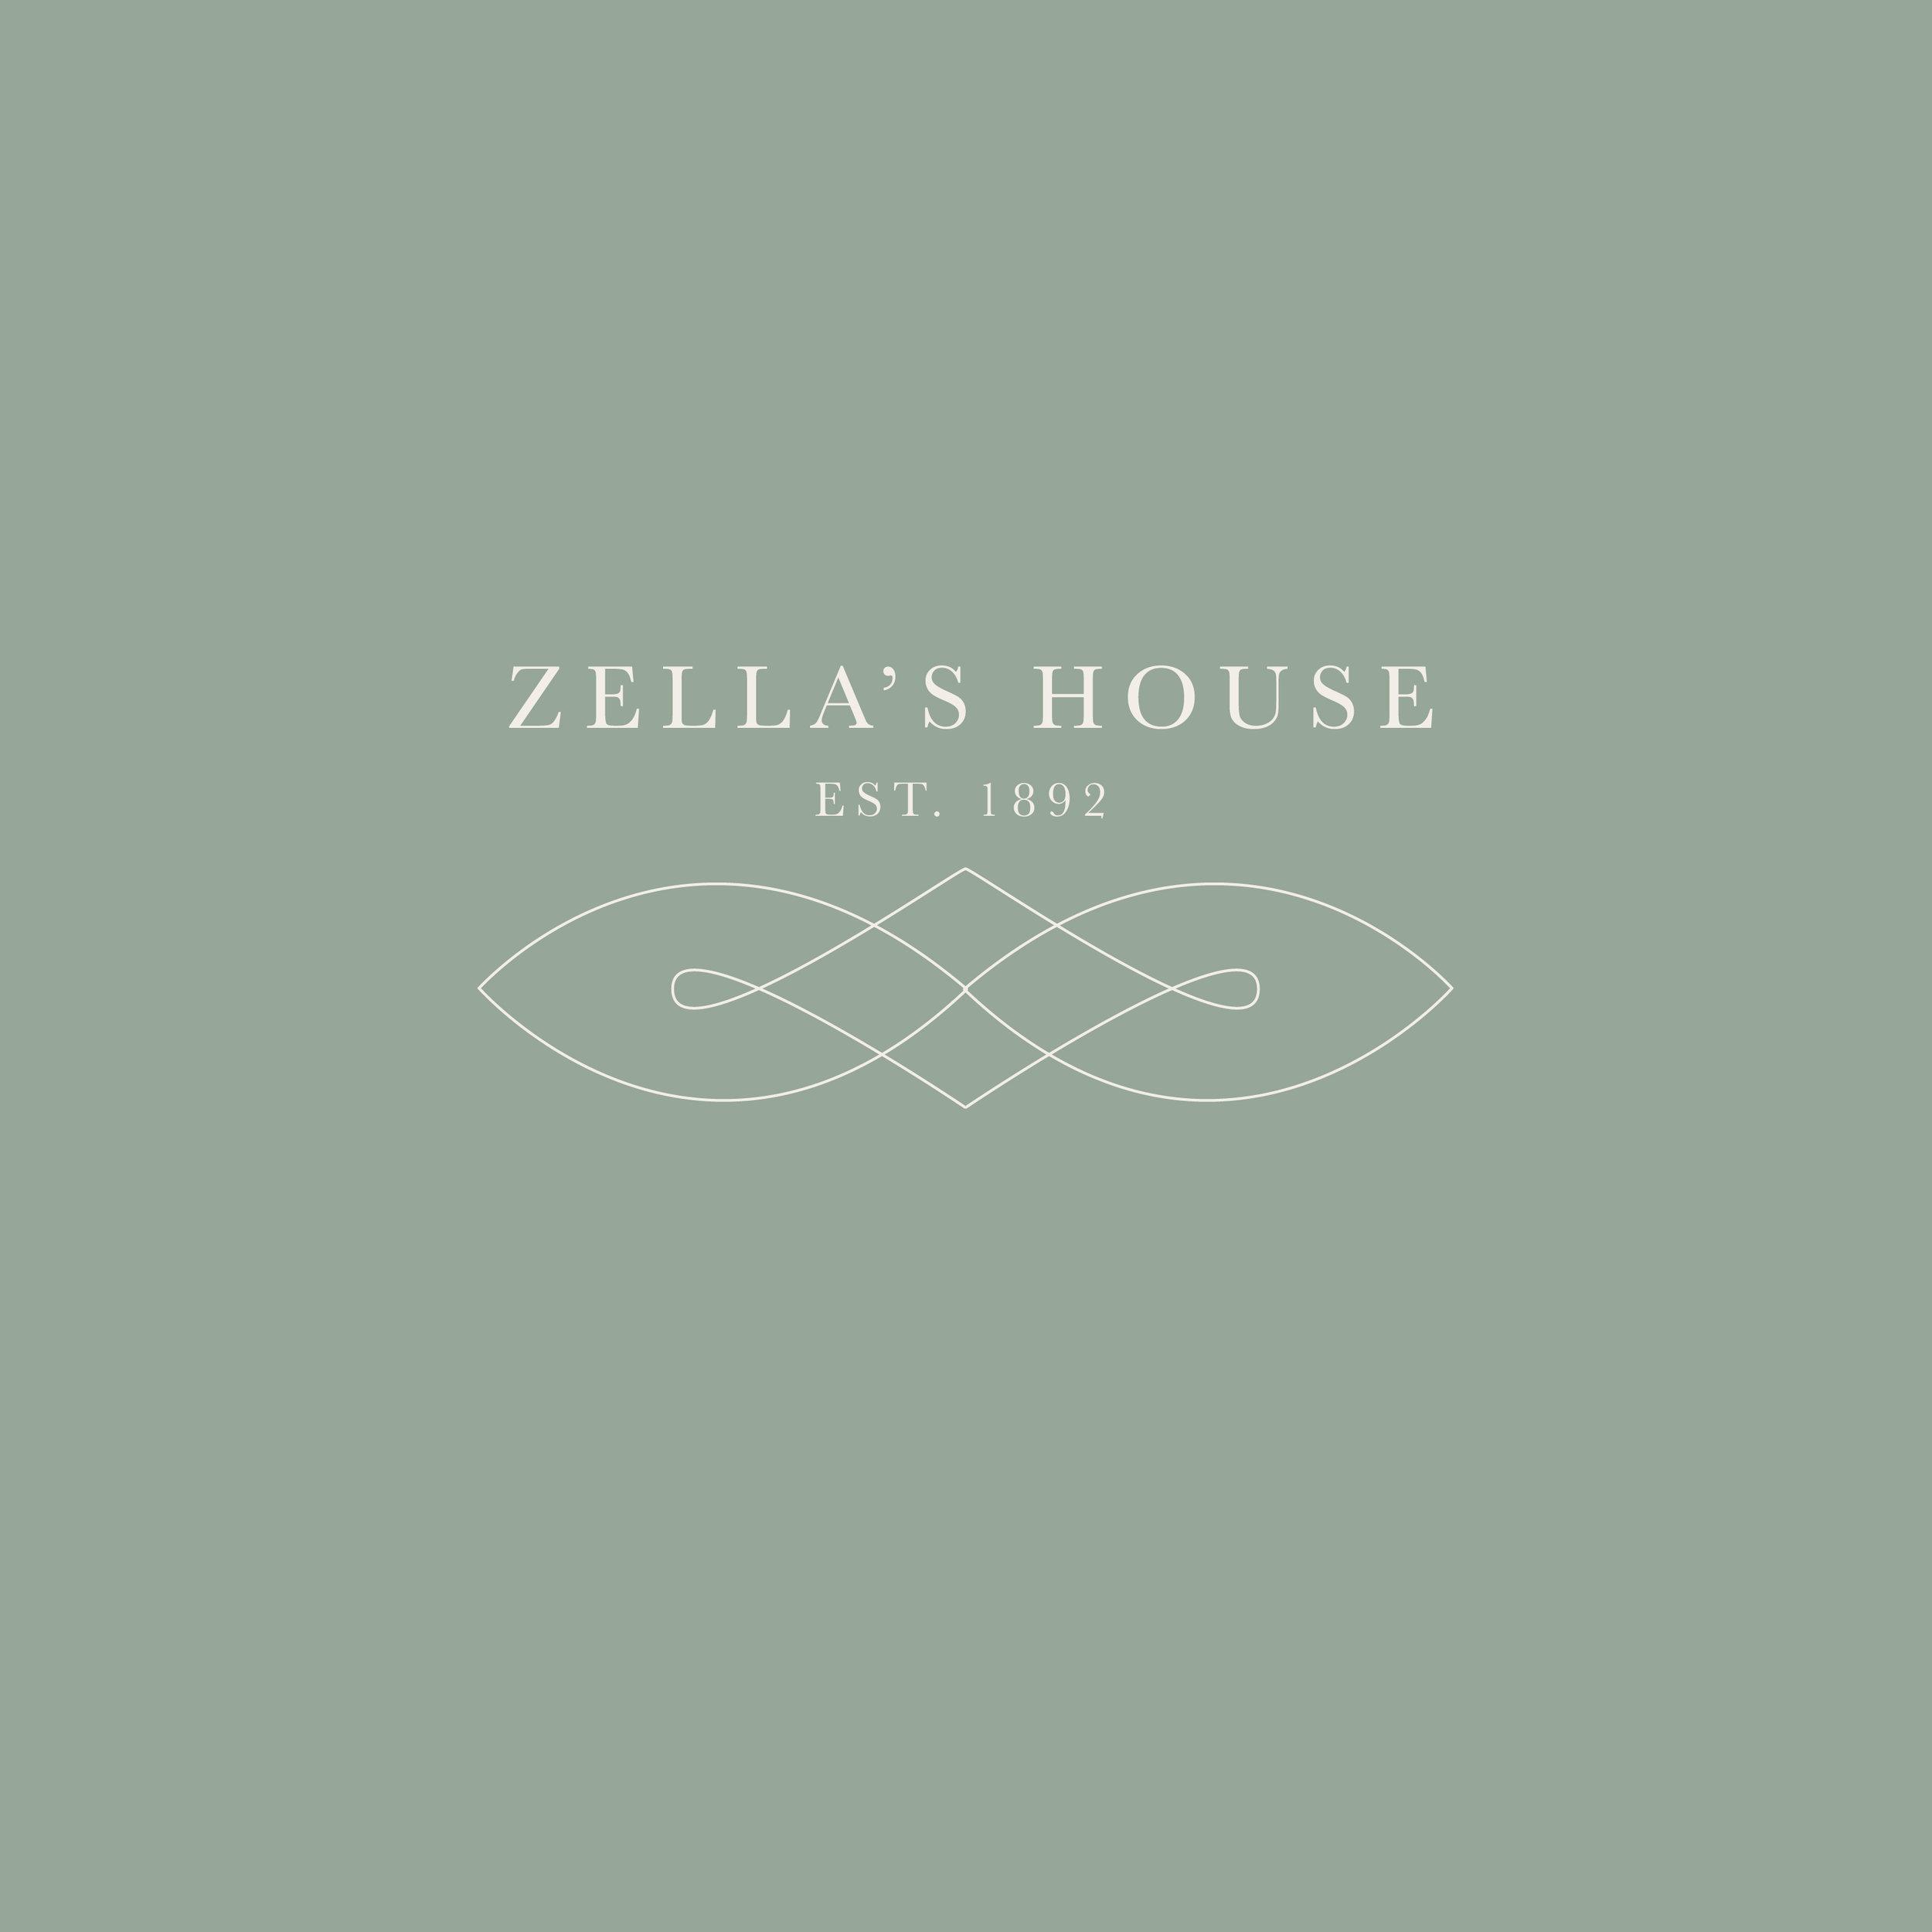 zellashouse_green.jpg